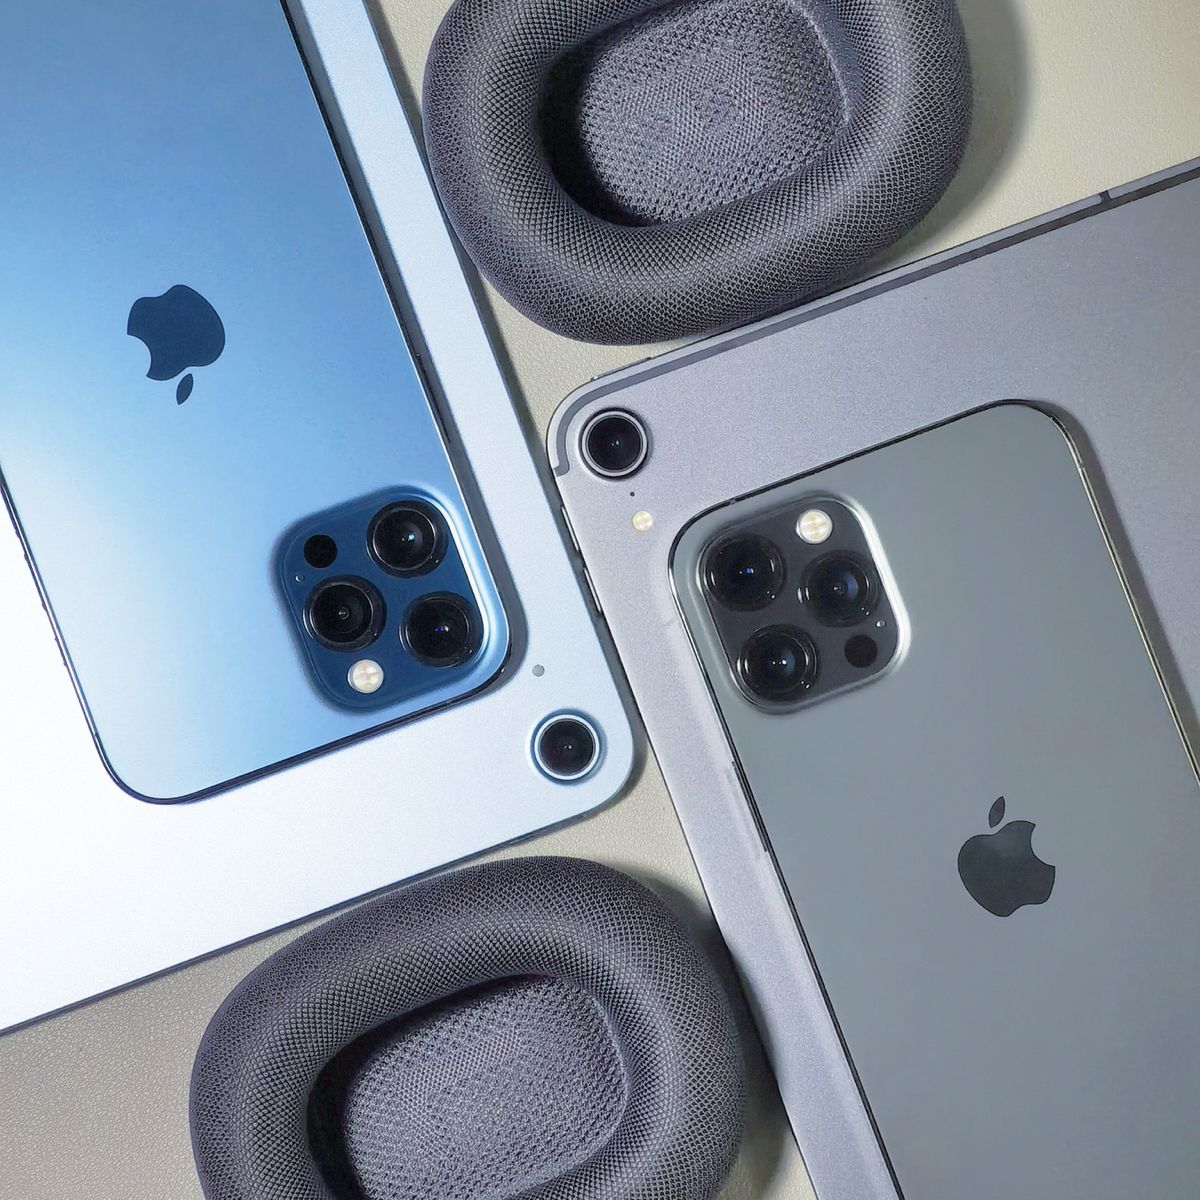 iPhone 12 Pro Max with iPad Pro 2020 / iPad Air 4 em 2021 ...